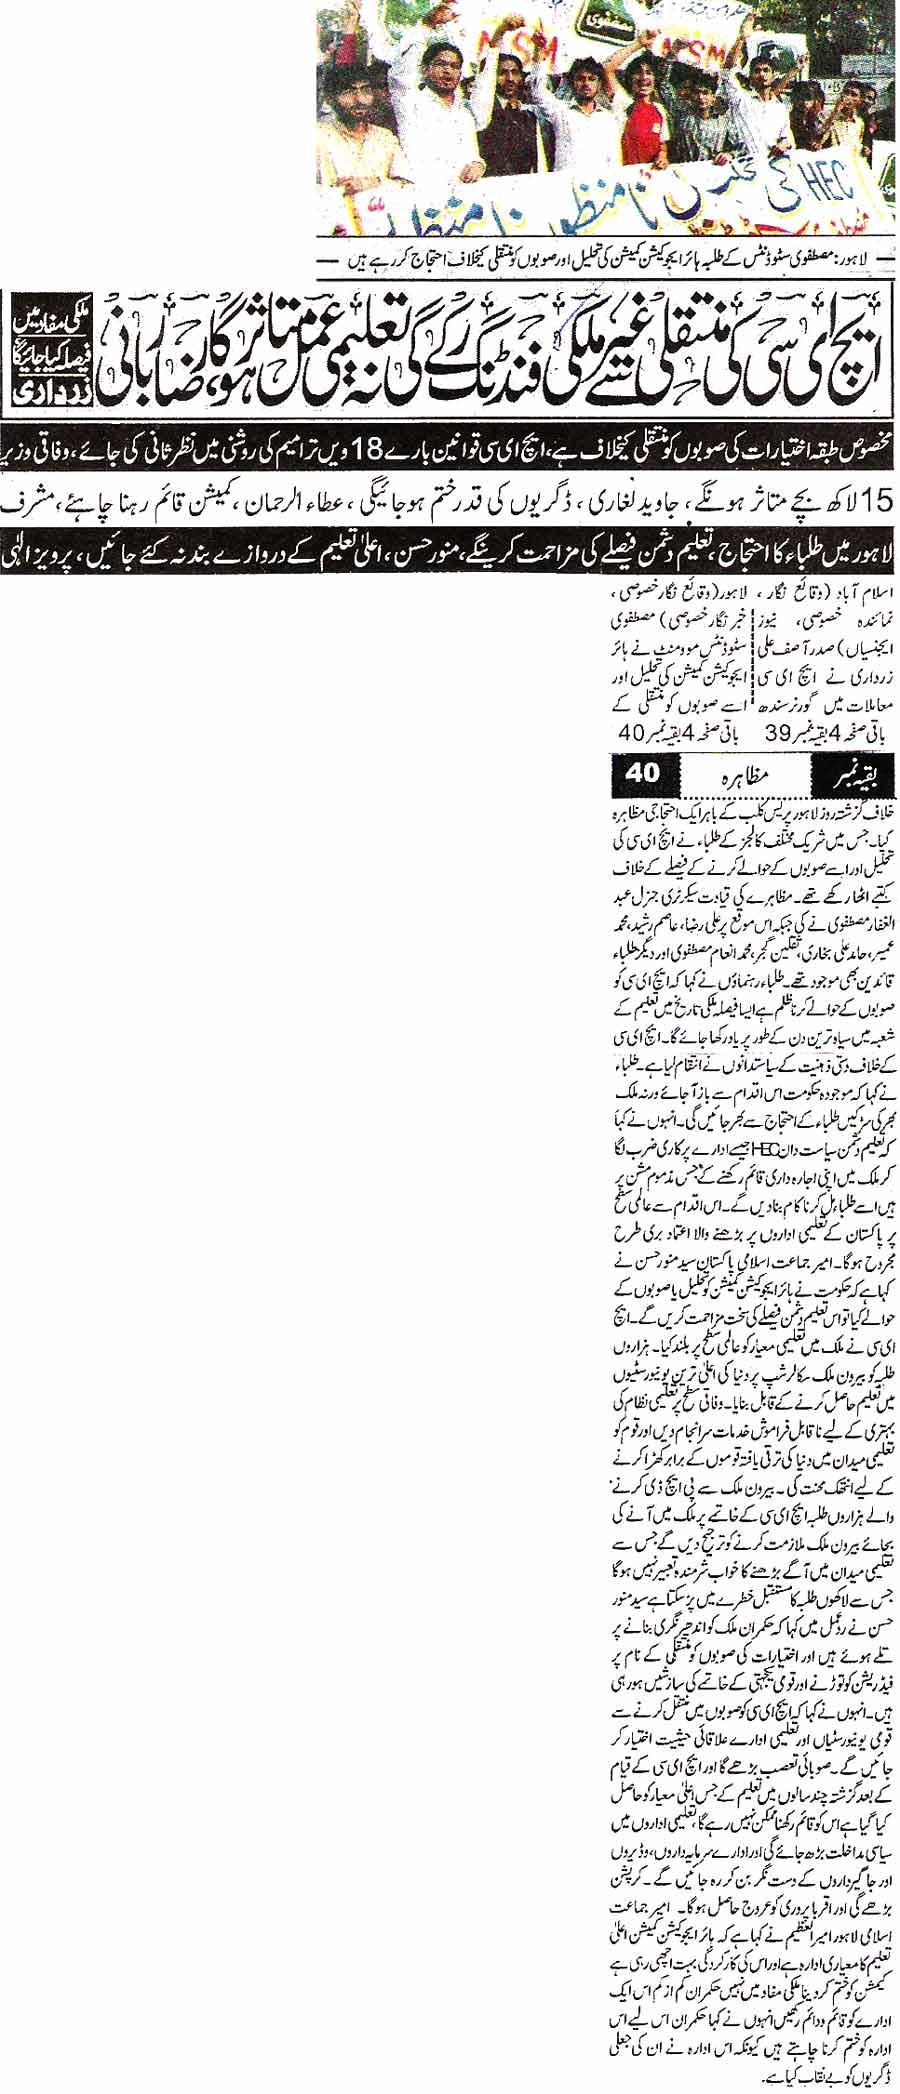 تحریک منہاج القرآن Minhaj-ul-Quran  Print Media Coverage پرنٹ میڈیا کوریج Daily Ausaf Page 1